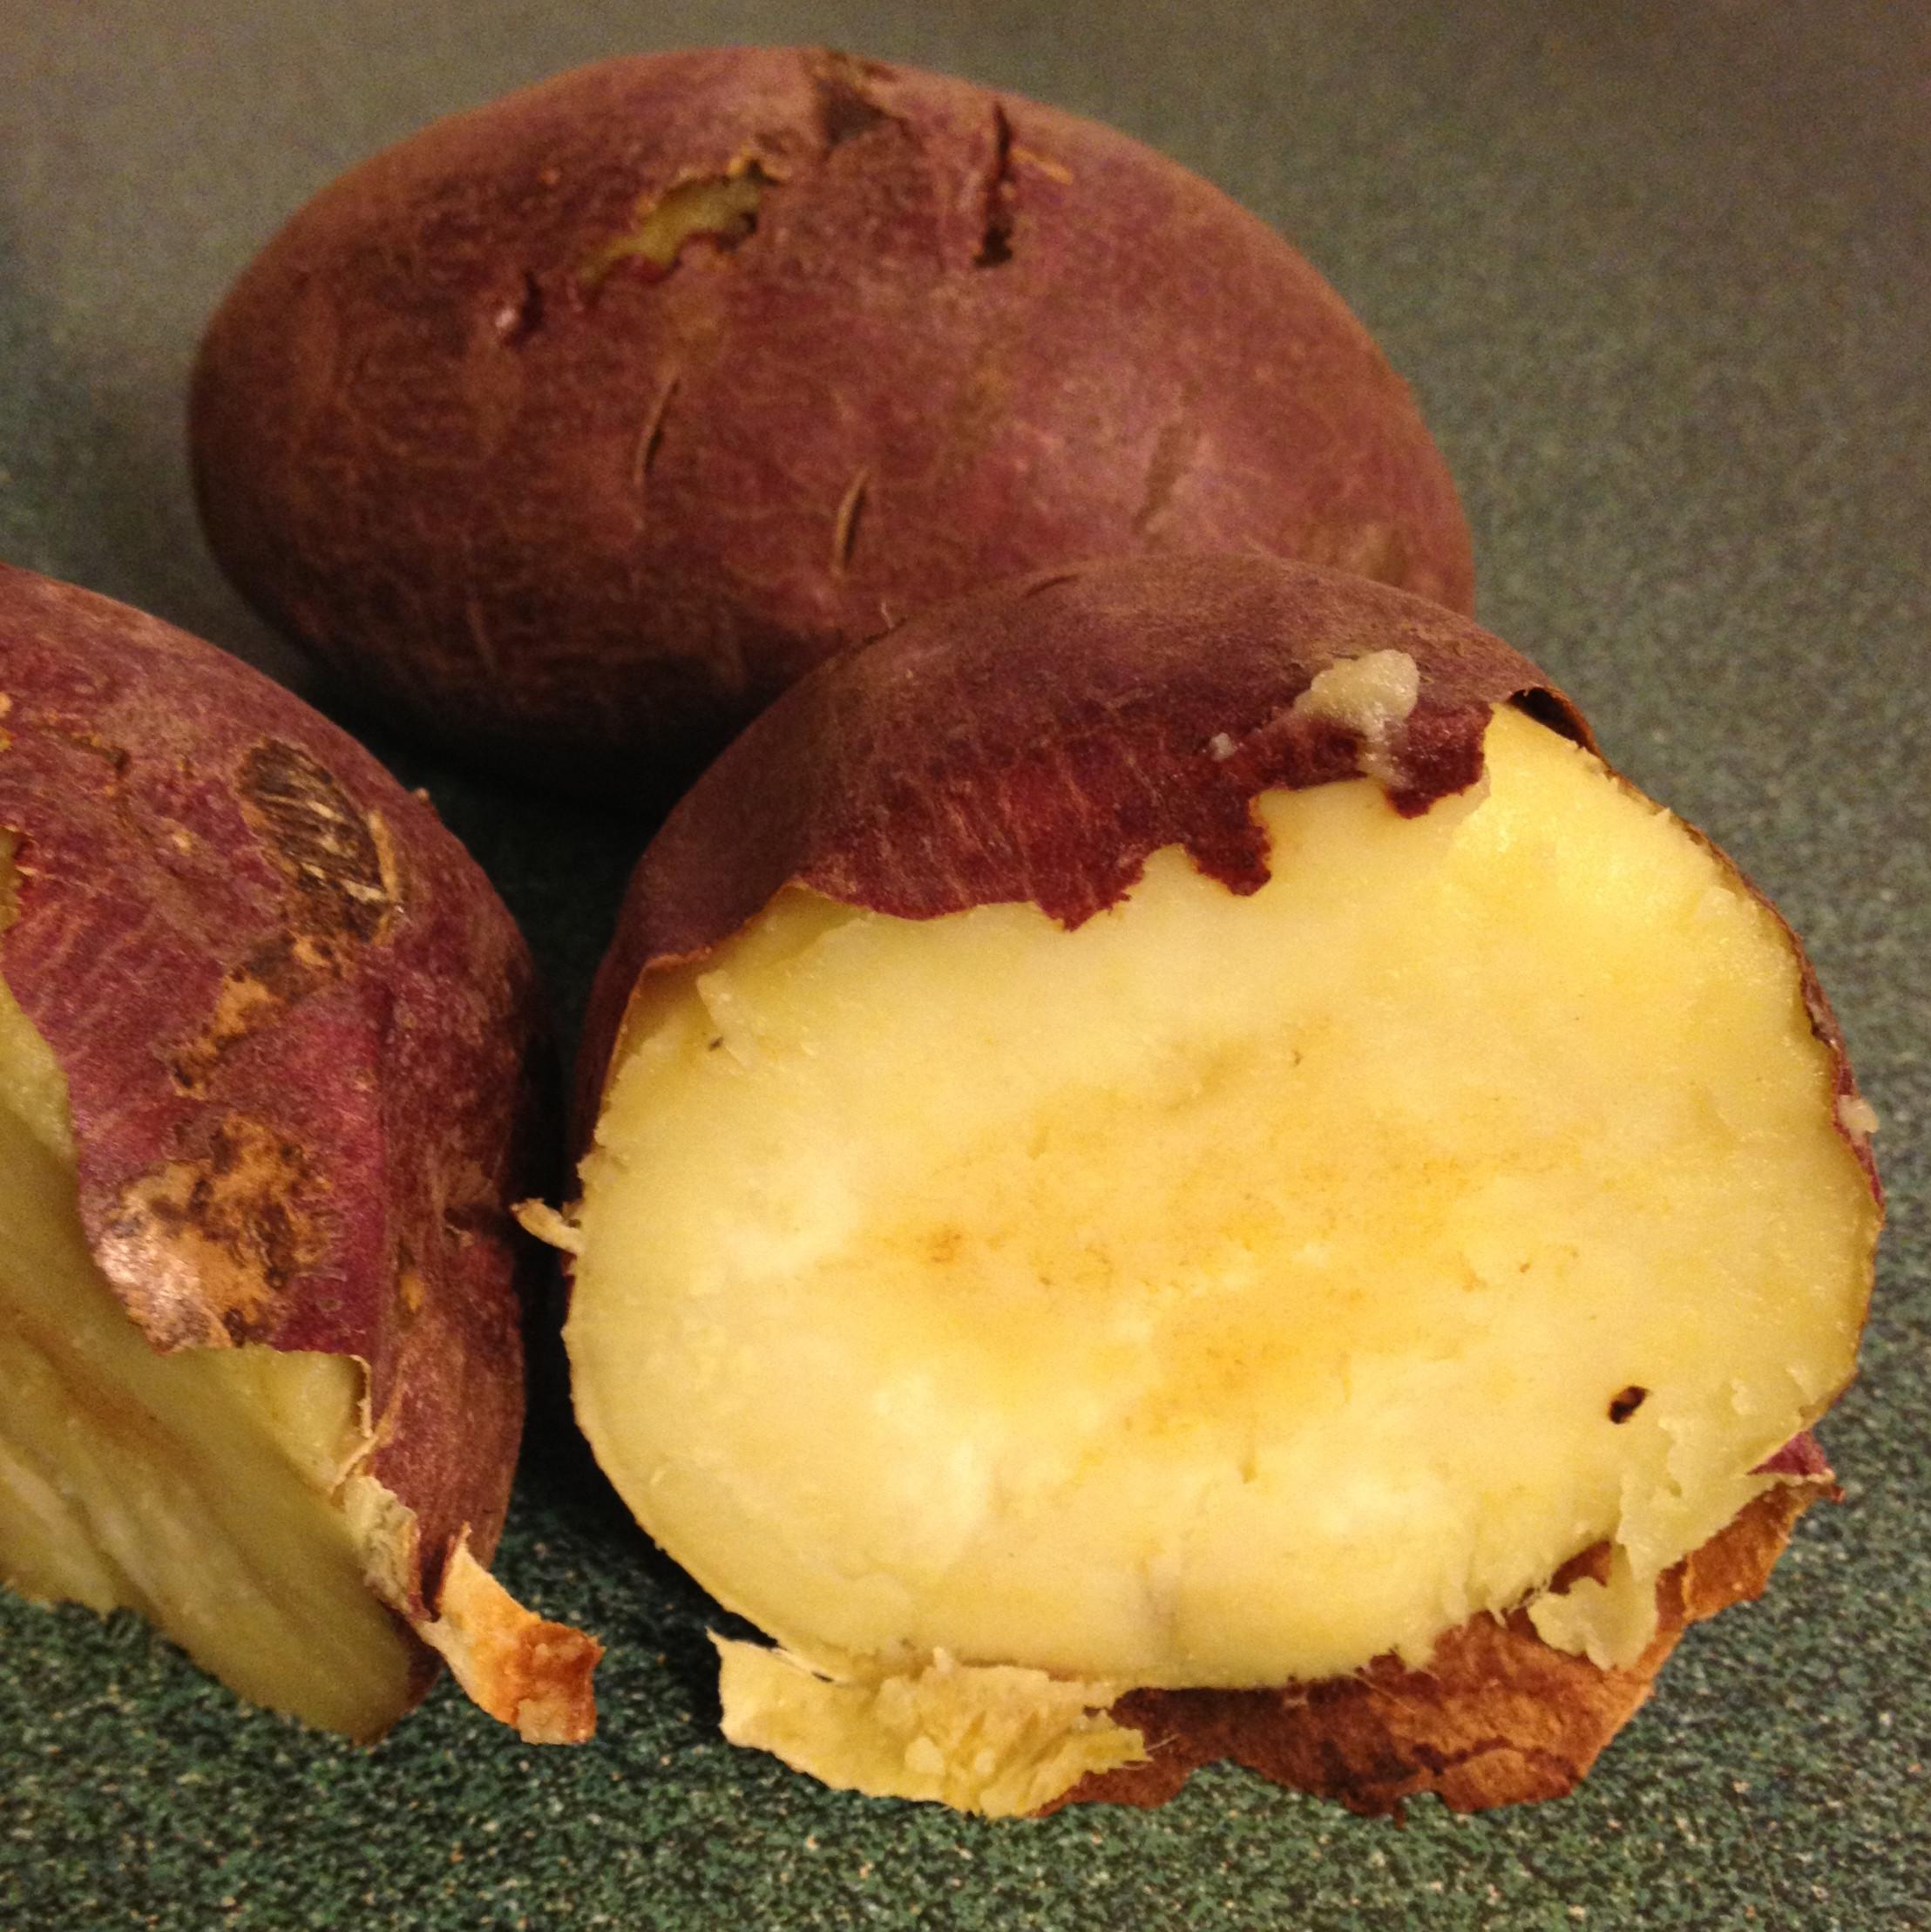 Potato In Japanese  Kale Artichoke Dip